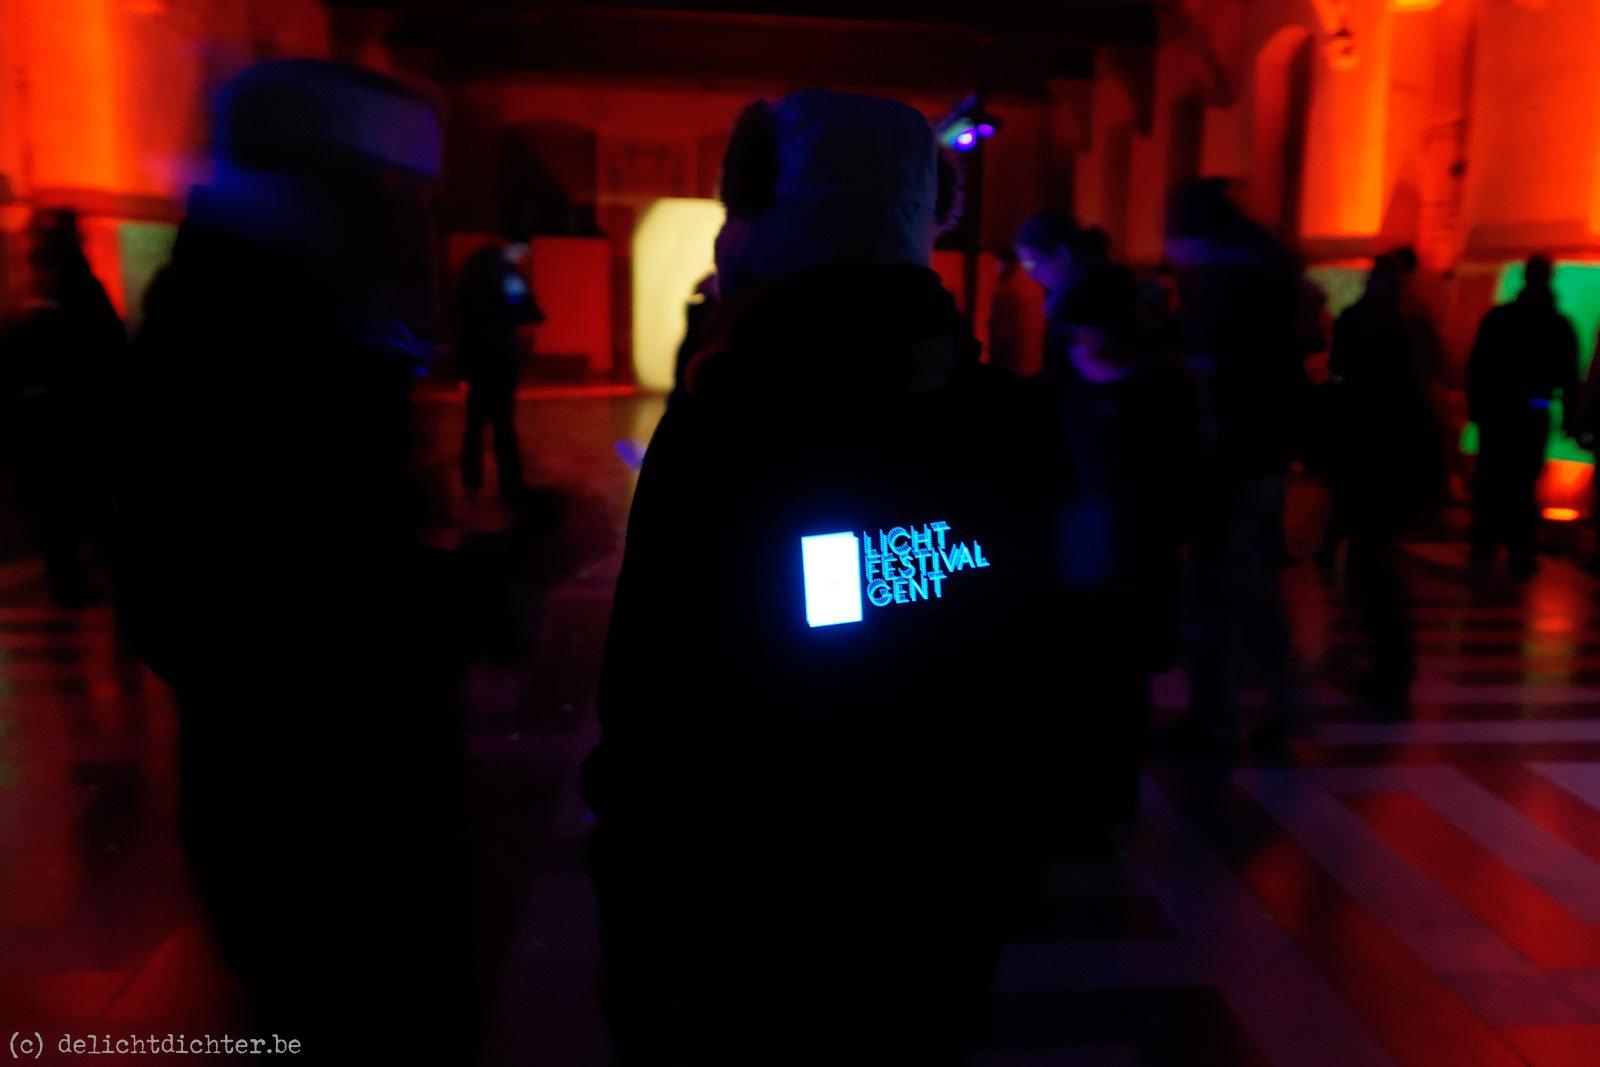 2011_01_lichtfestivalgent_20110128_002256_dxo